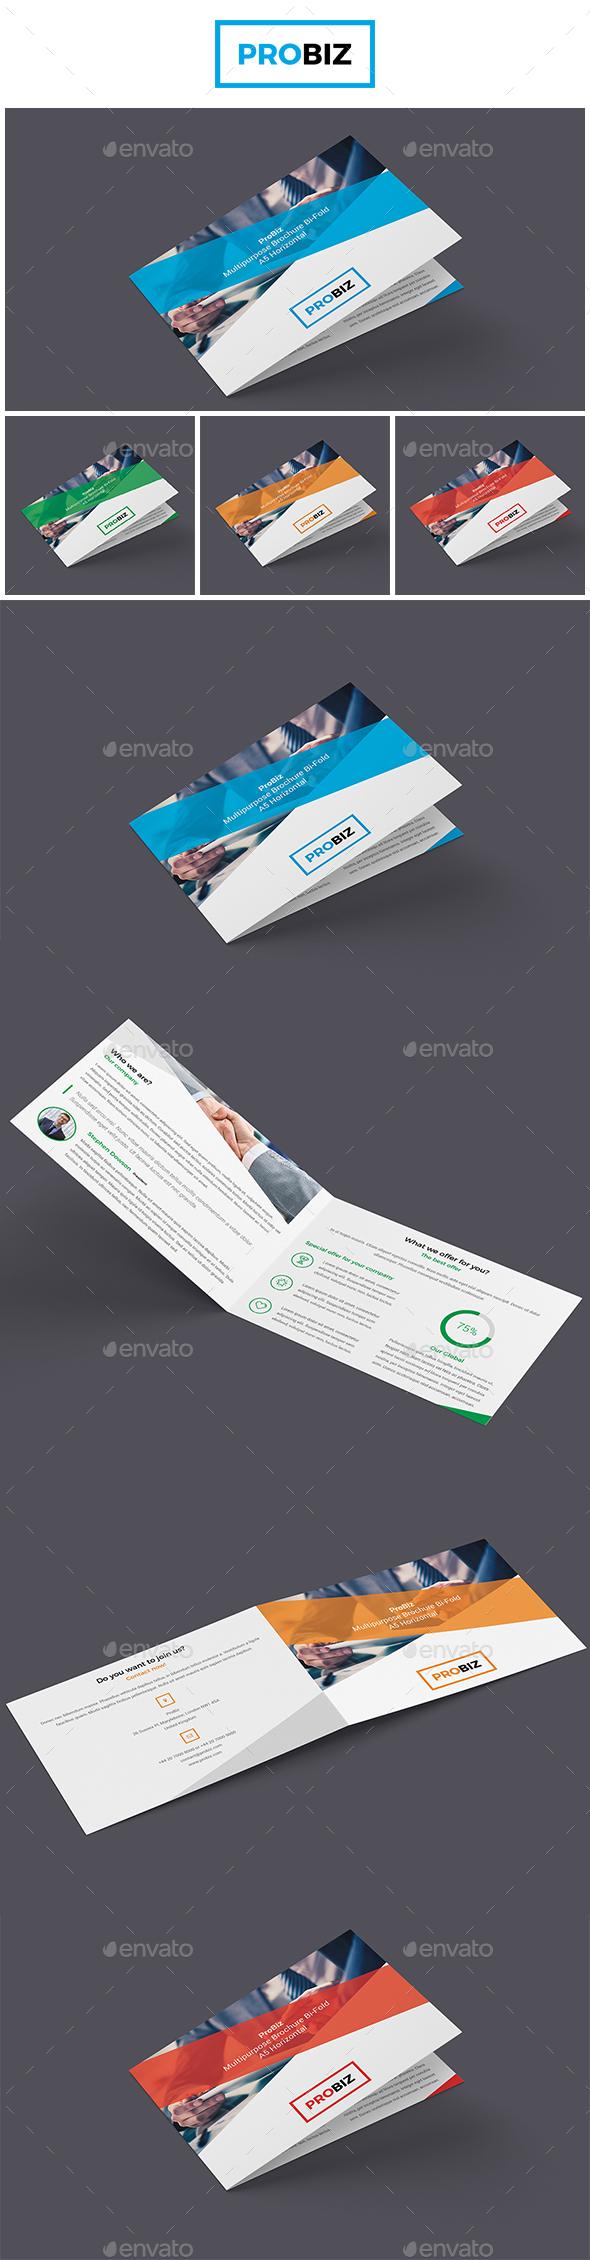 ProBiz - Business and Corporate Brochure Bi-Fold A5 Horizontal - Corporate Brochures